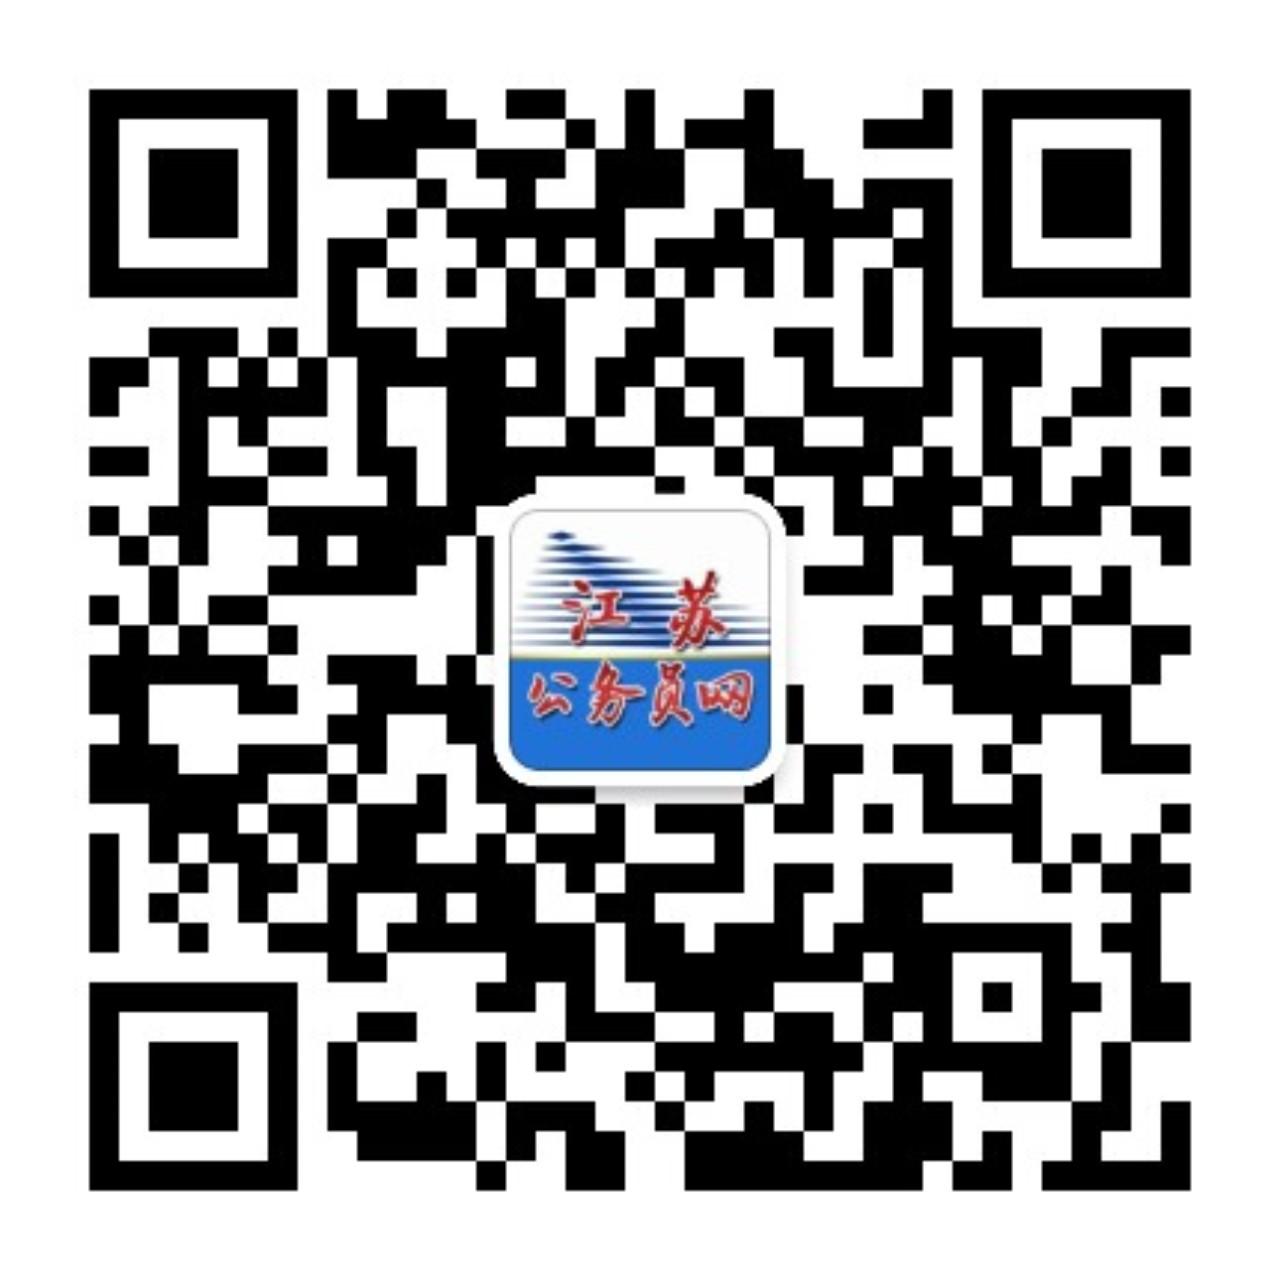 http://www.nthuaimage.com/youxiyule/32463.html